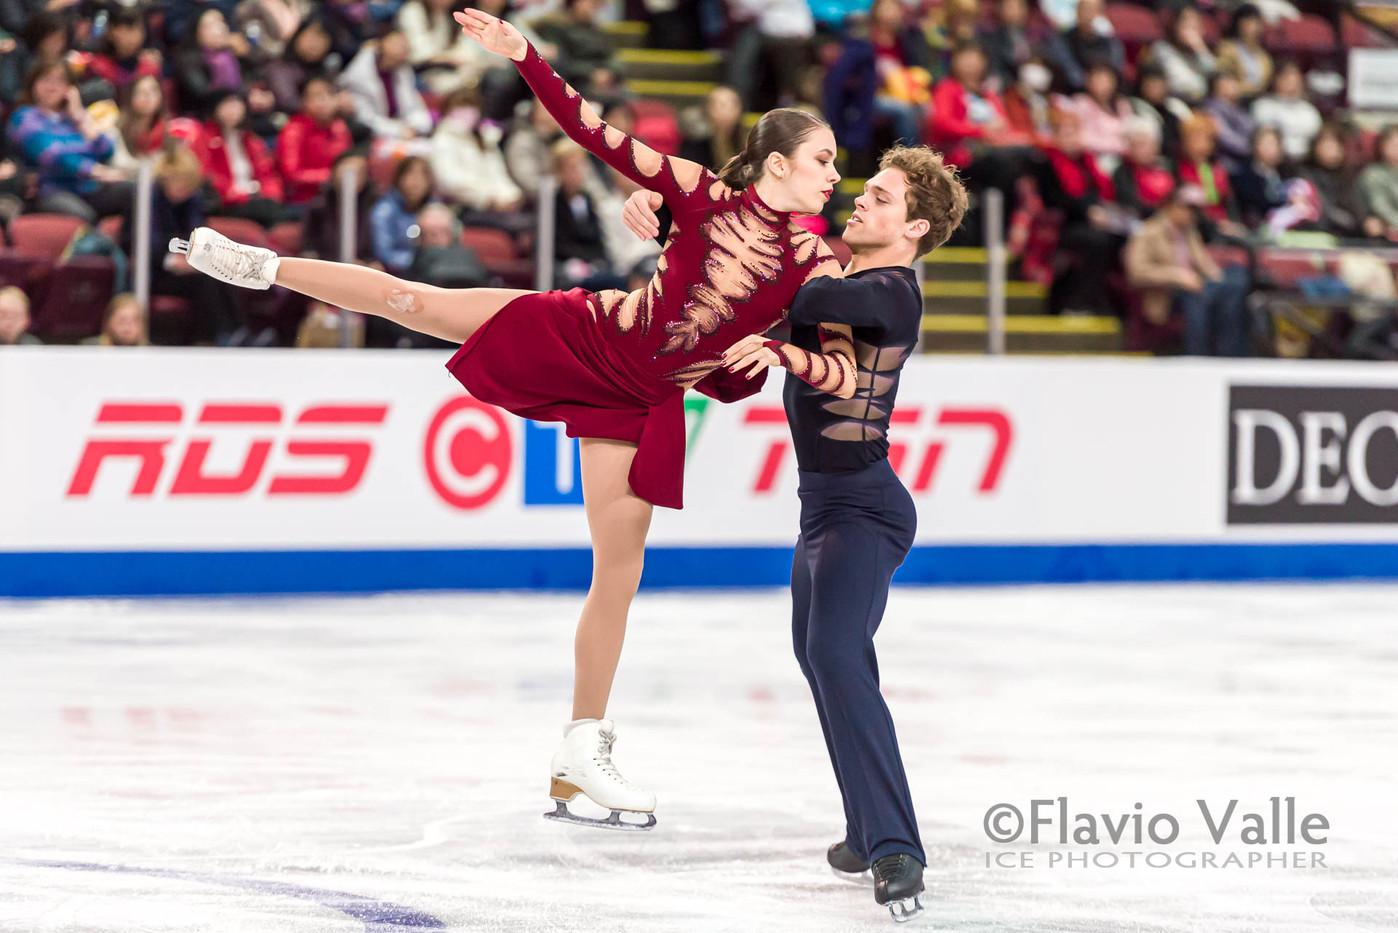 7th Caroline GREEN : Michael PARSONS1.jp